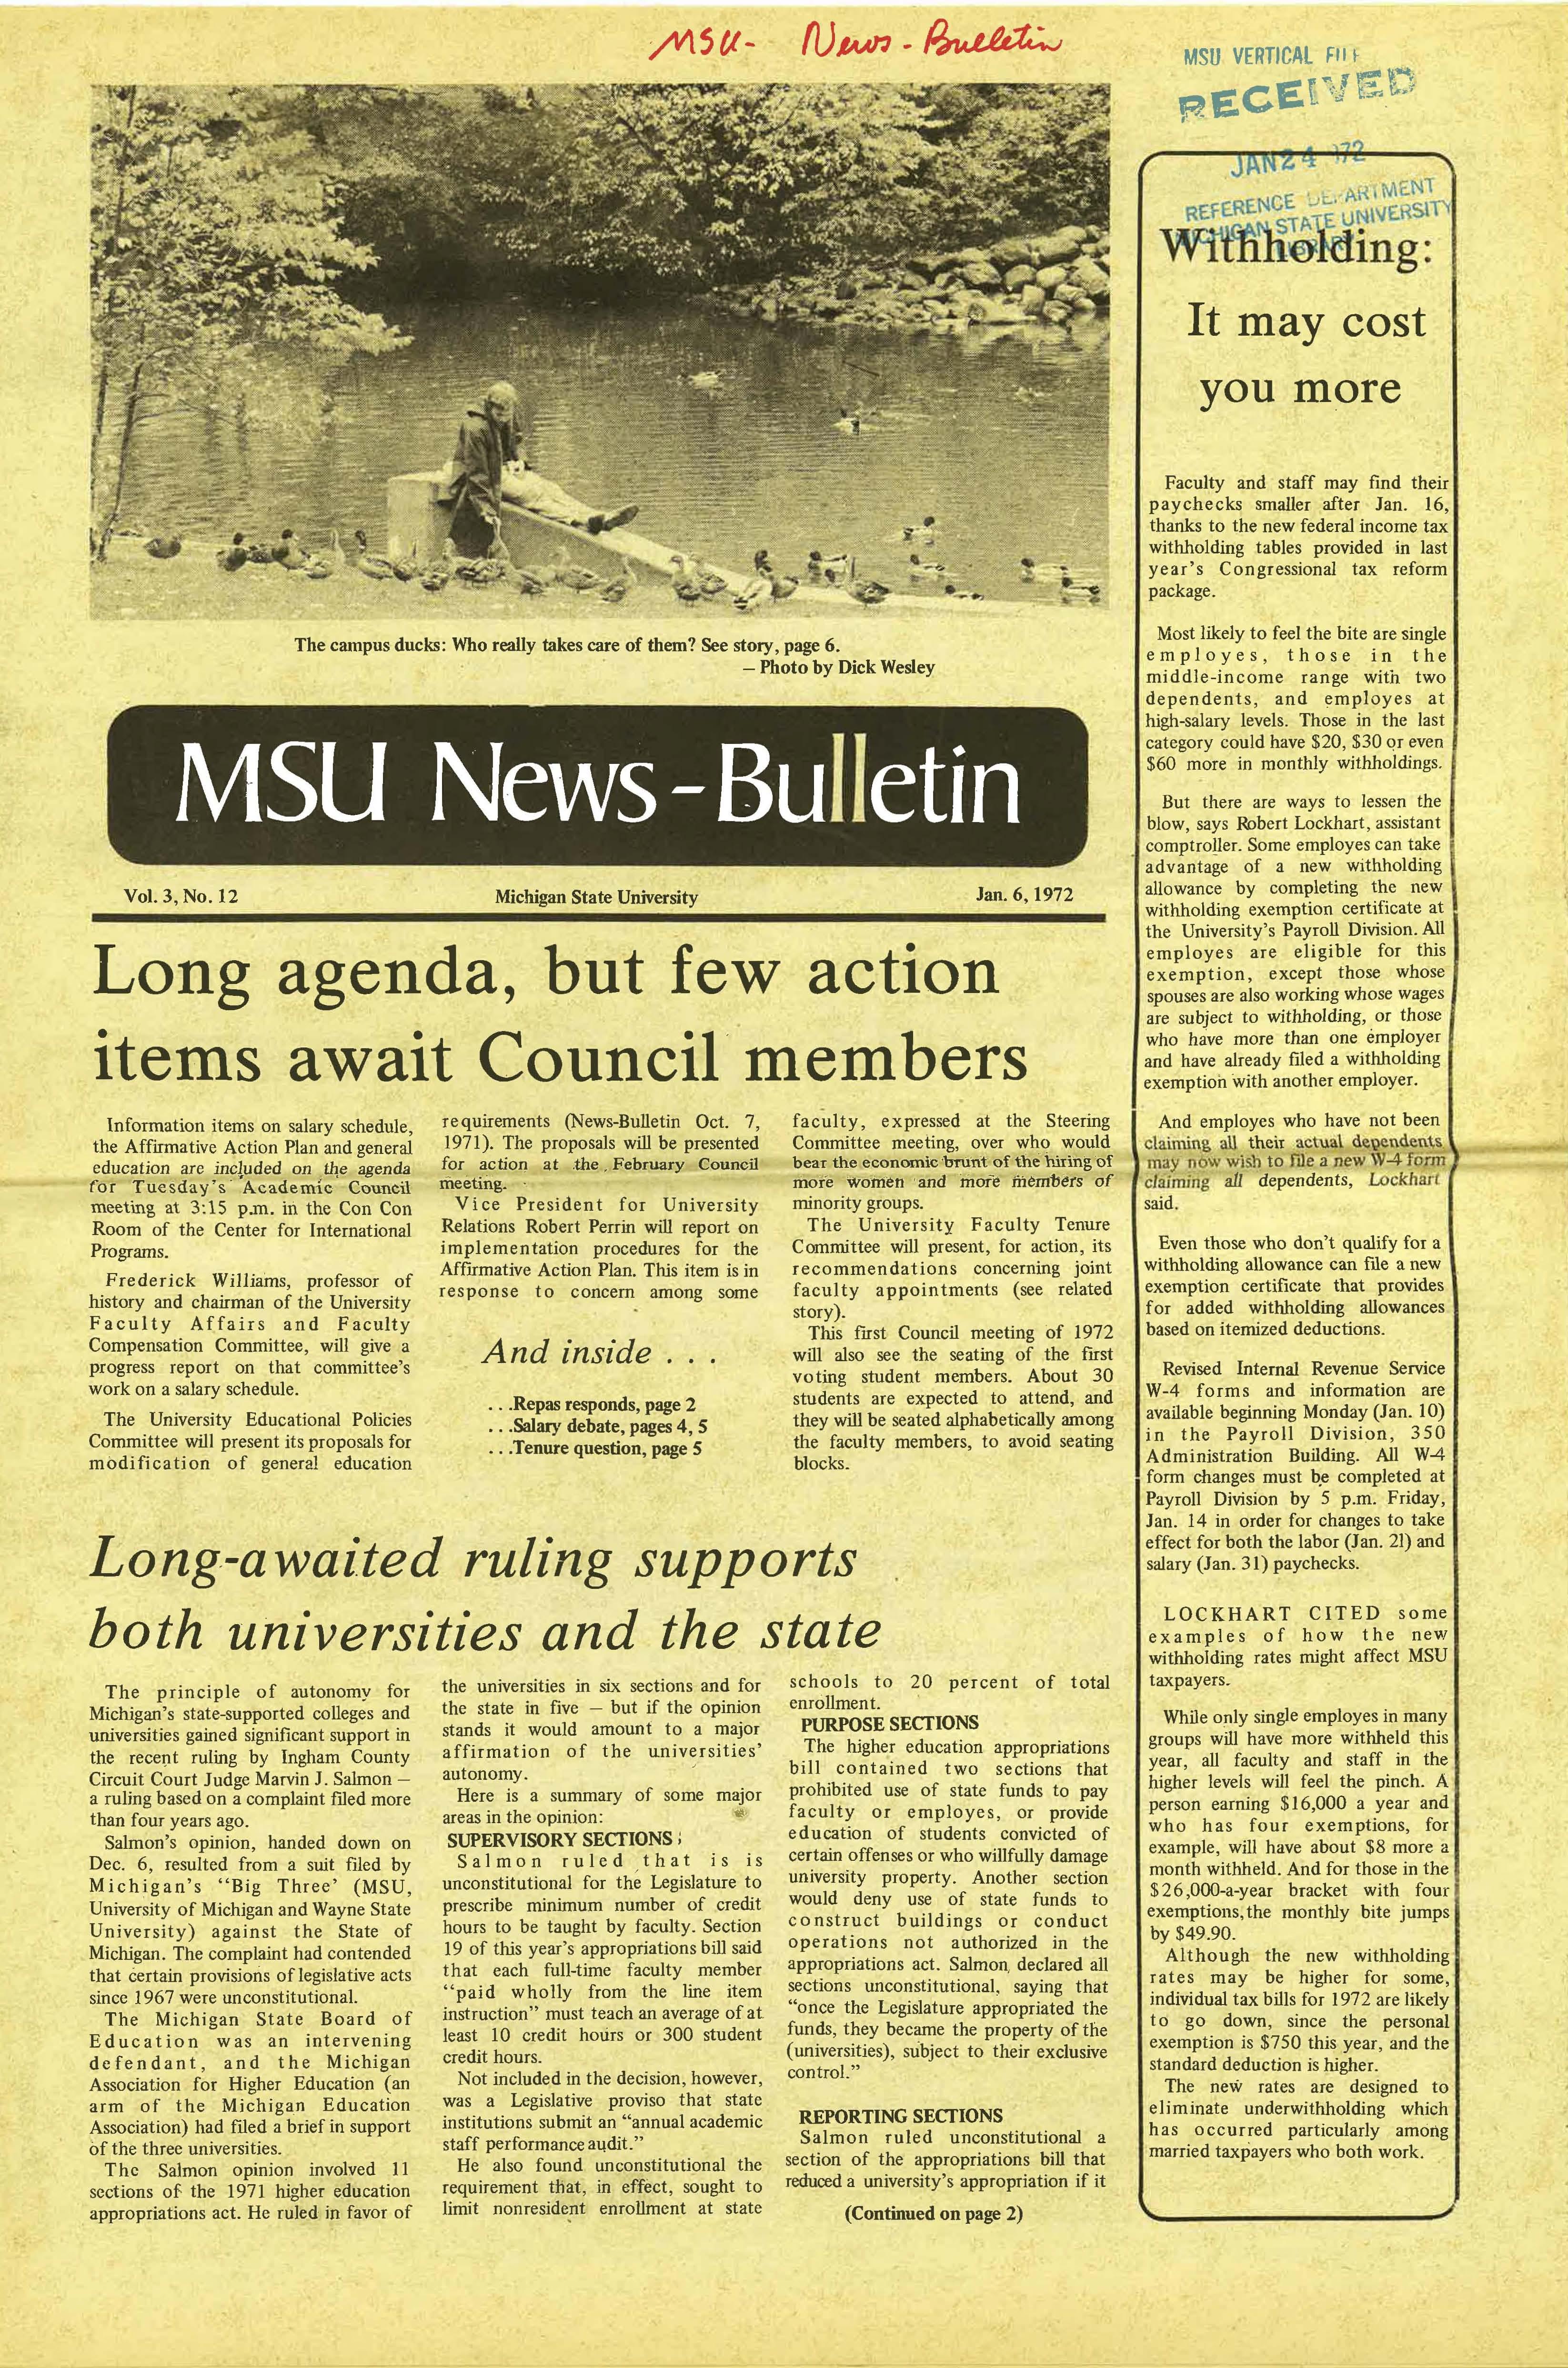 MSU News Bulletin, vol. 3, No. 18, February 17, 1972